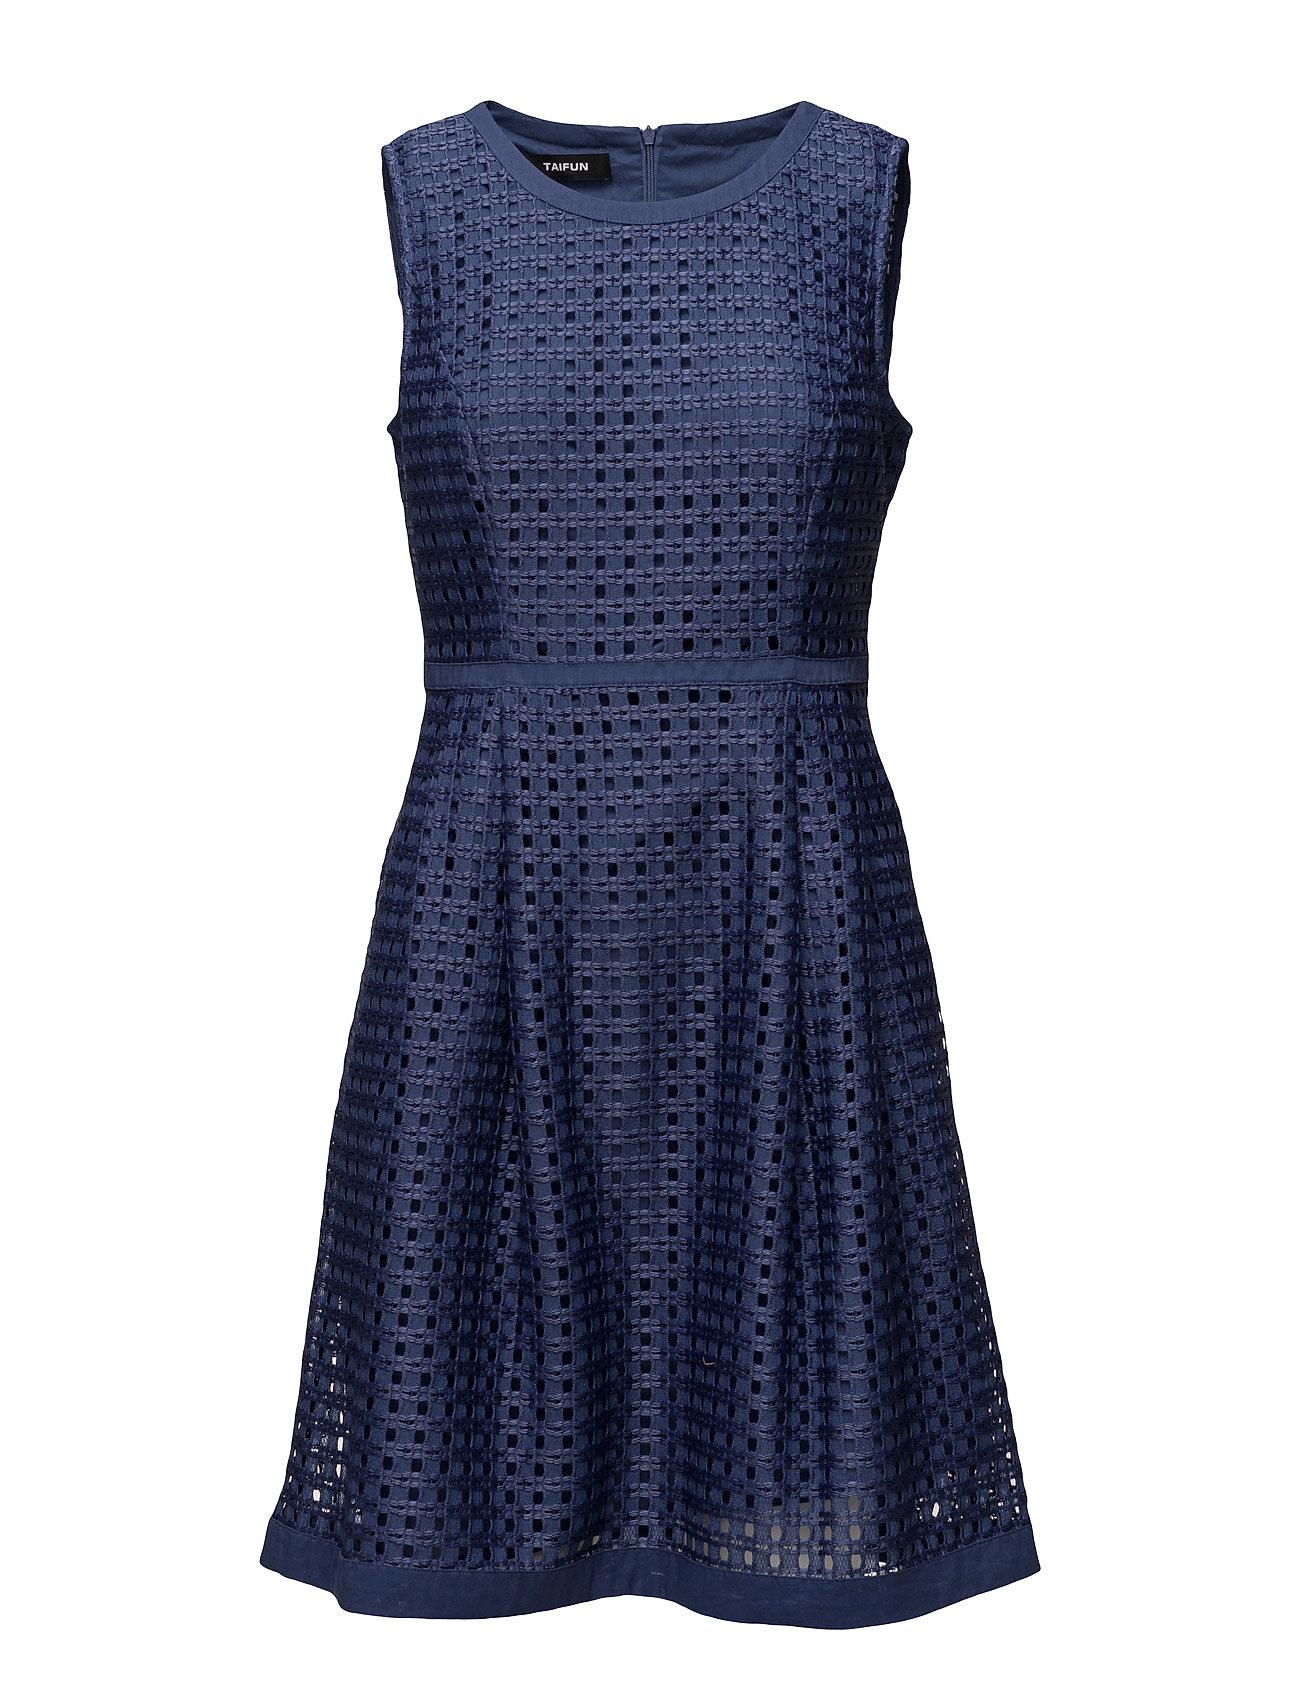 Dress woven fabric fra taifun på boozt.com dk